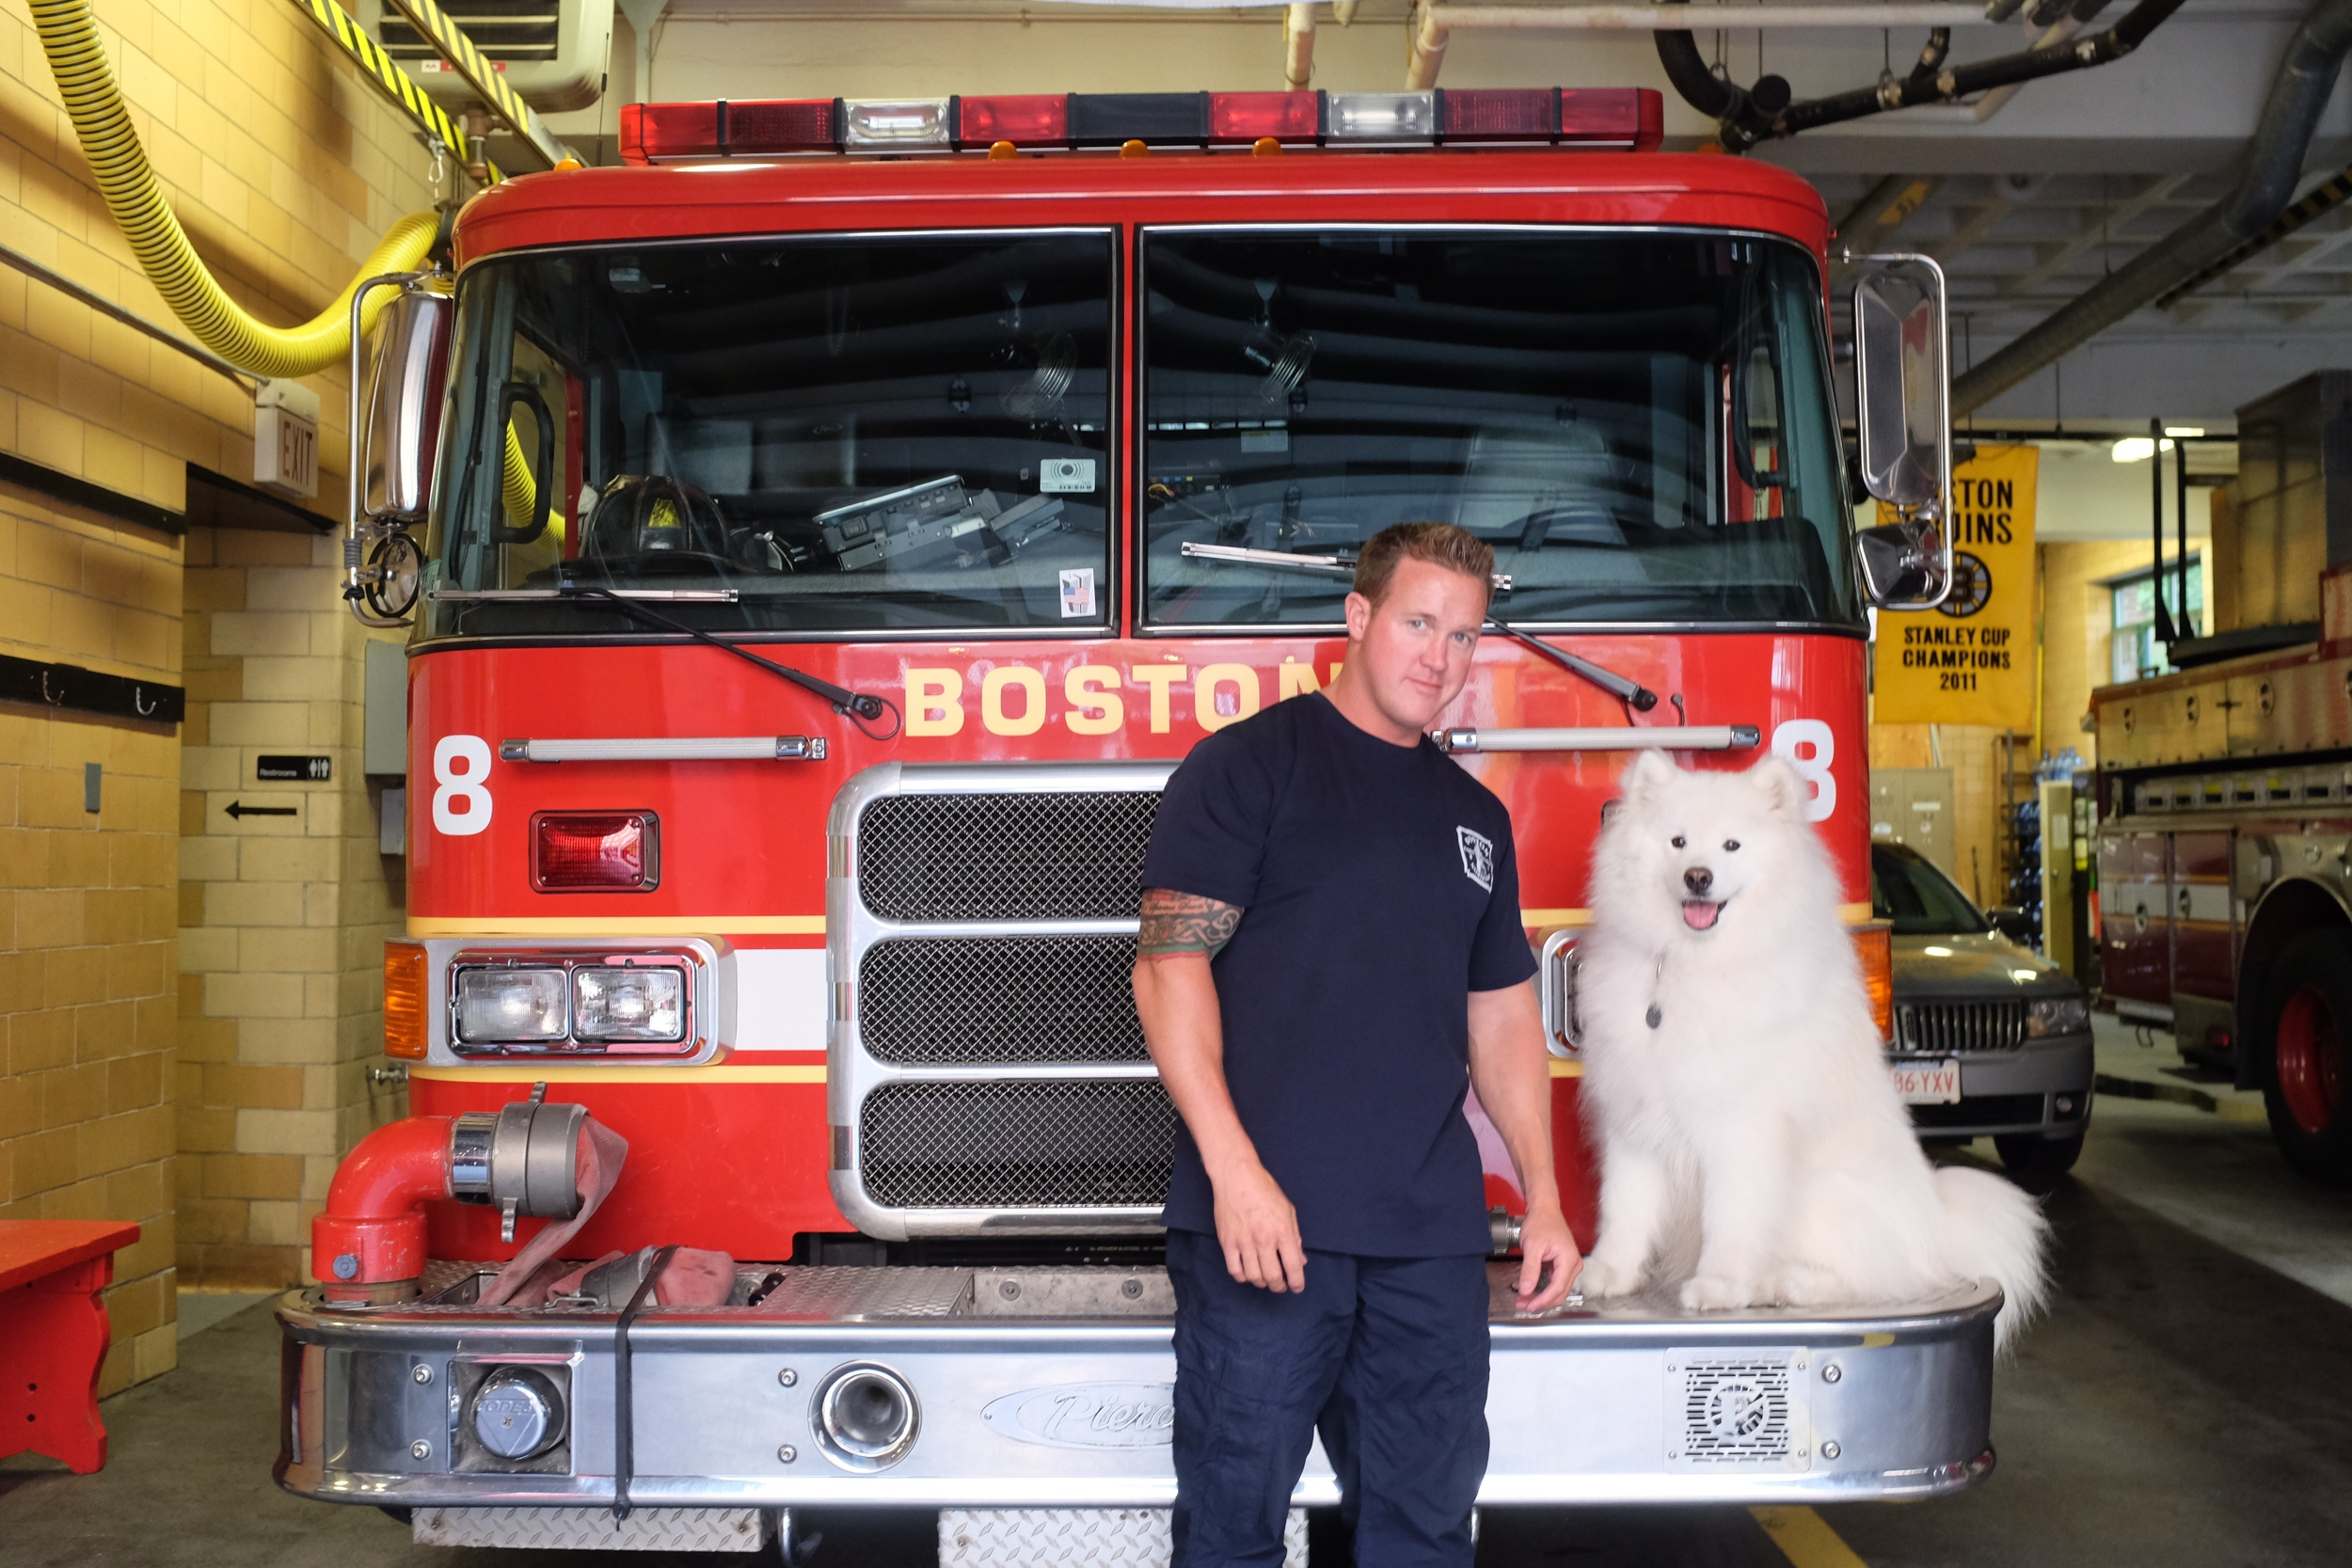 Engine 8, Boston's North End